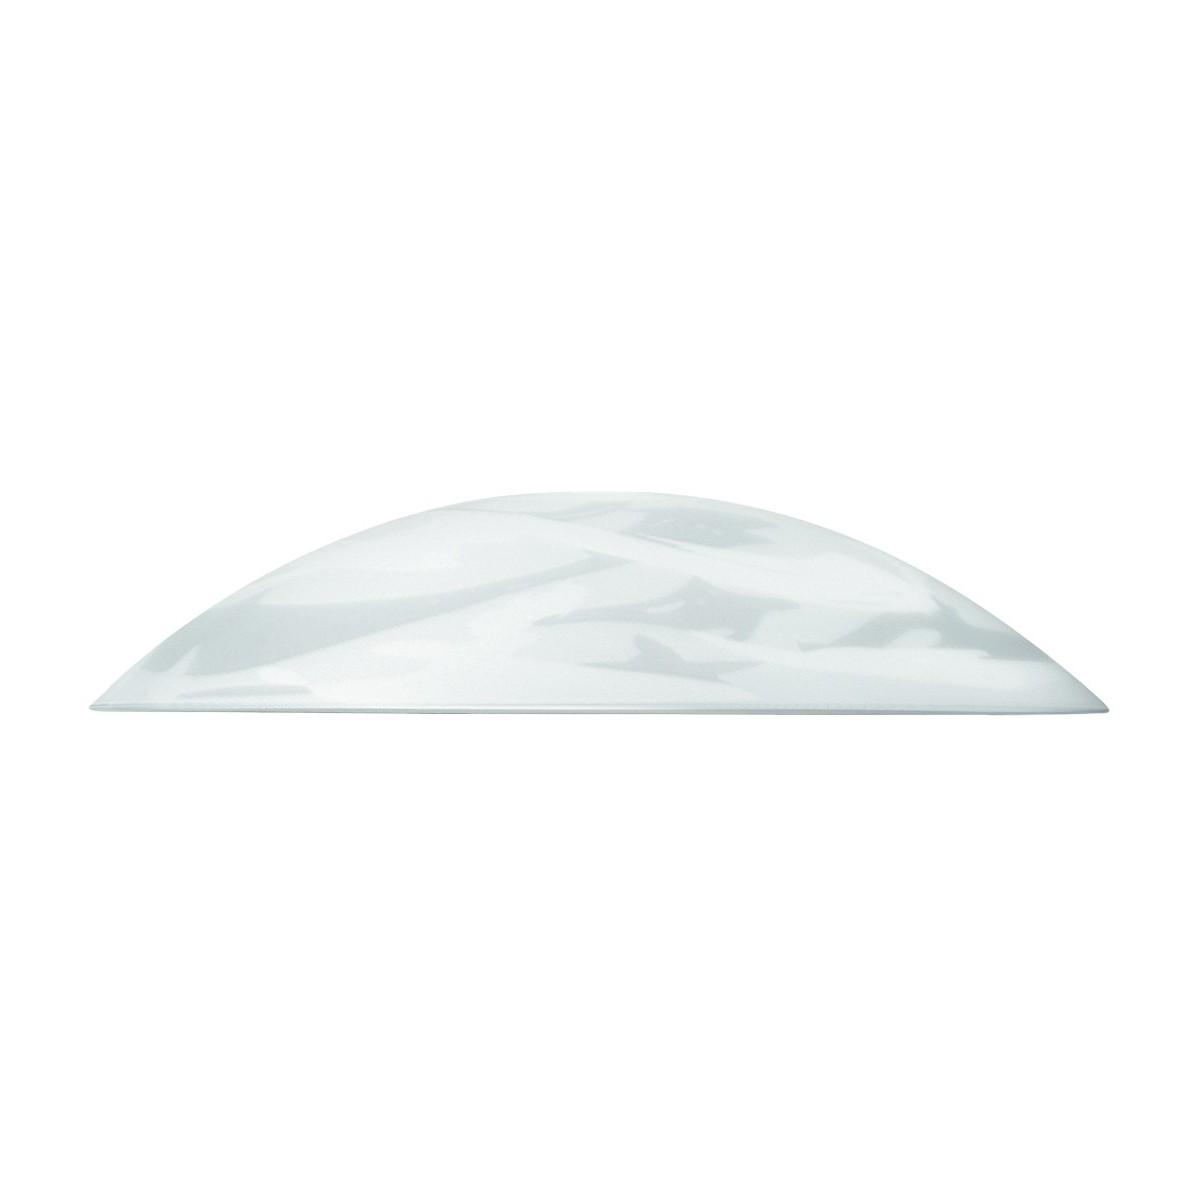 I-V00048400017 - Paralume per Sospensione Vetro Bianco Alabastro 48x10 cm F42